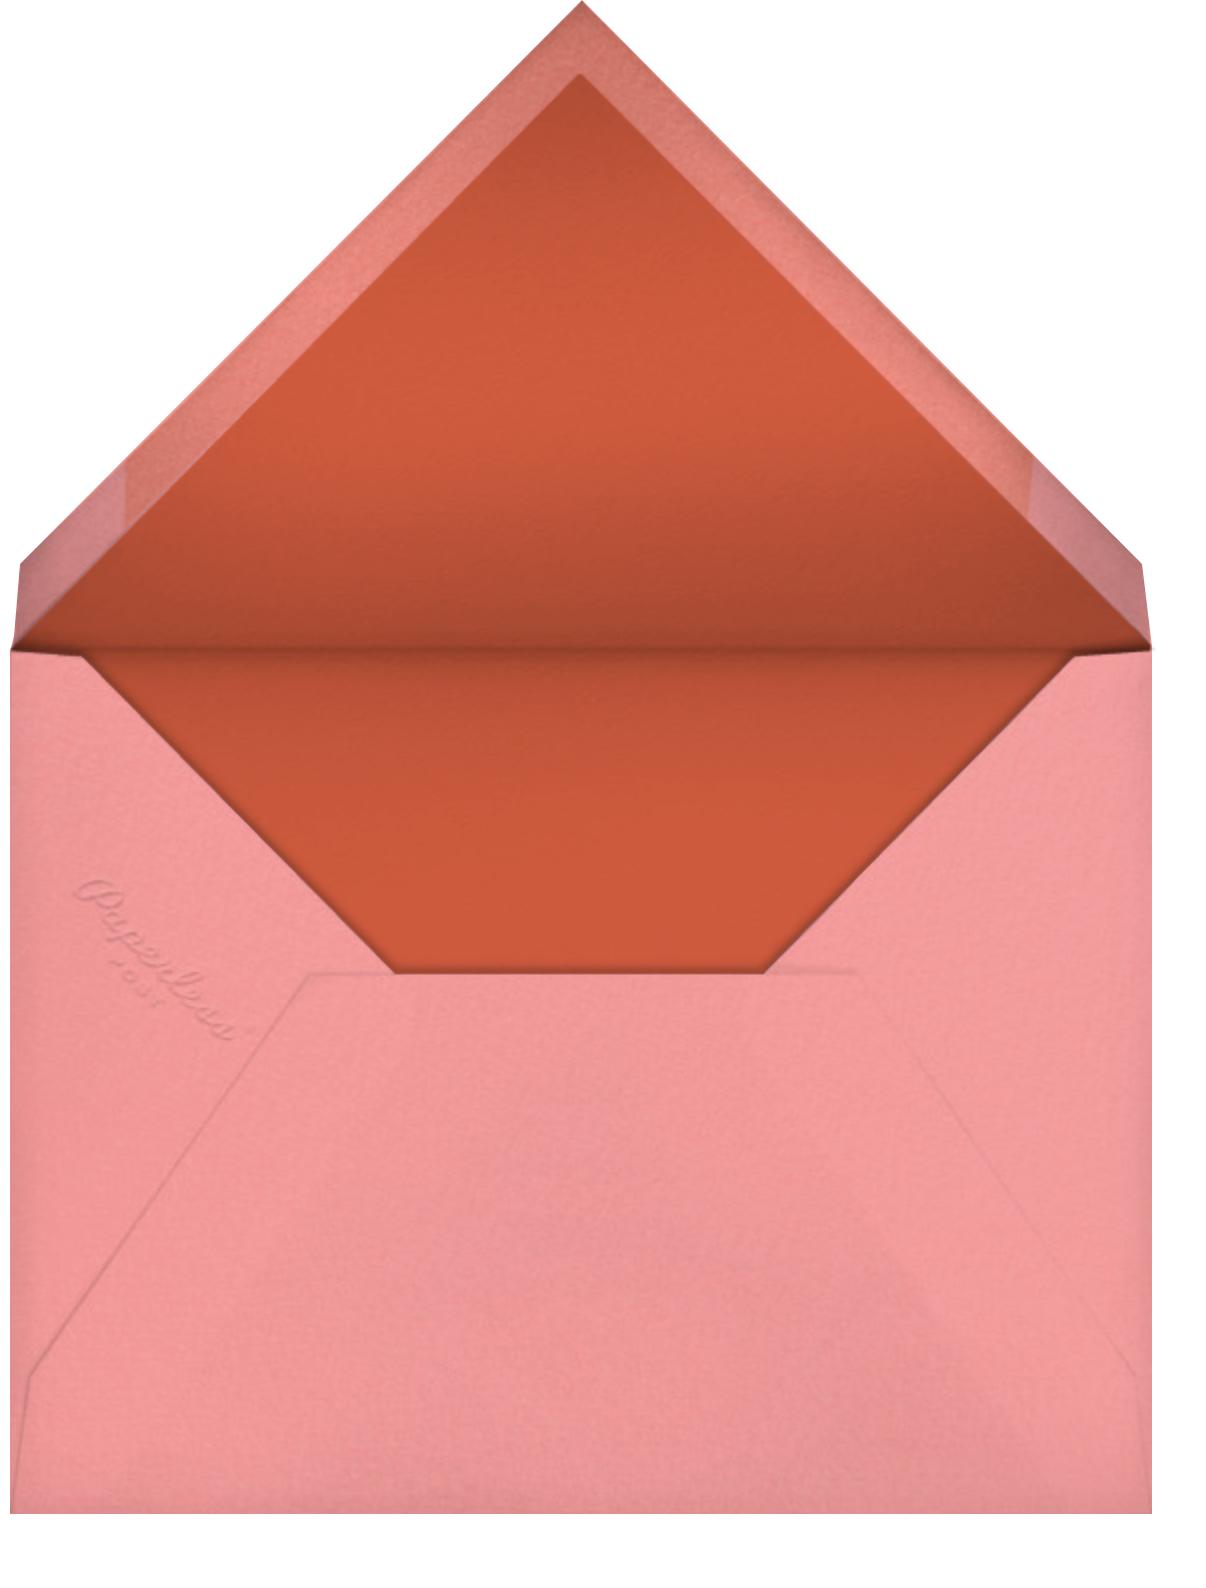 Mailbird (Barbara Dziadosz) - Red Cap Cards - Envelope